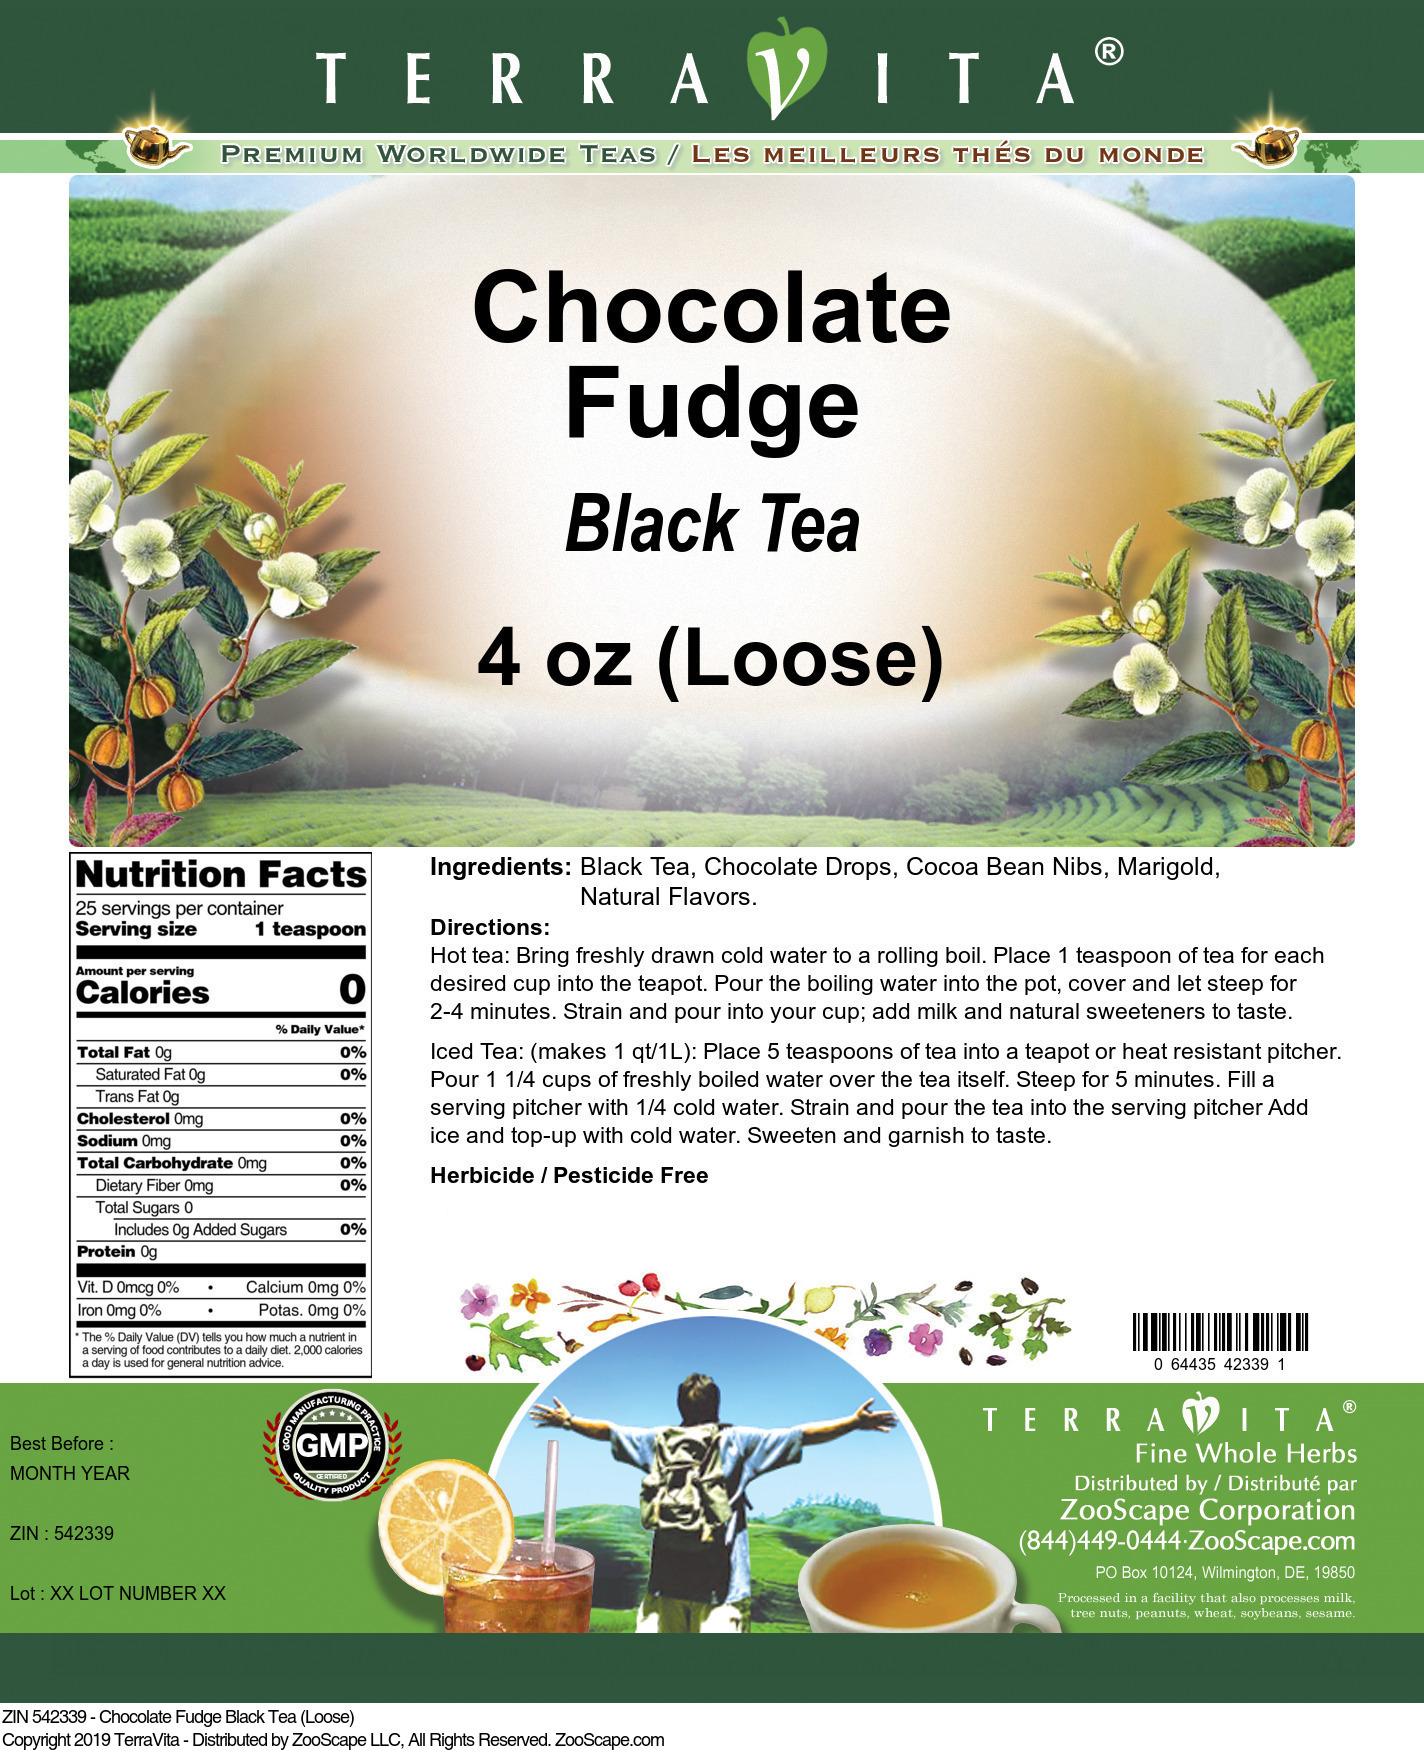 Chocolate Fudge Black Tea